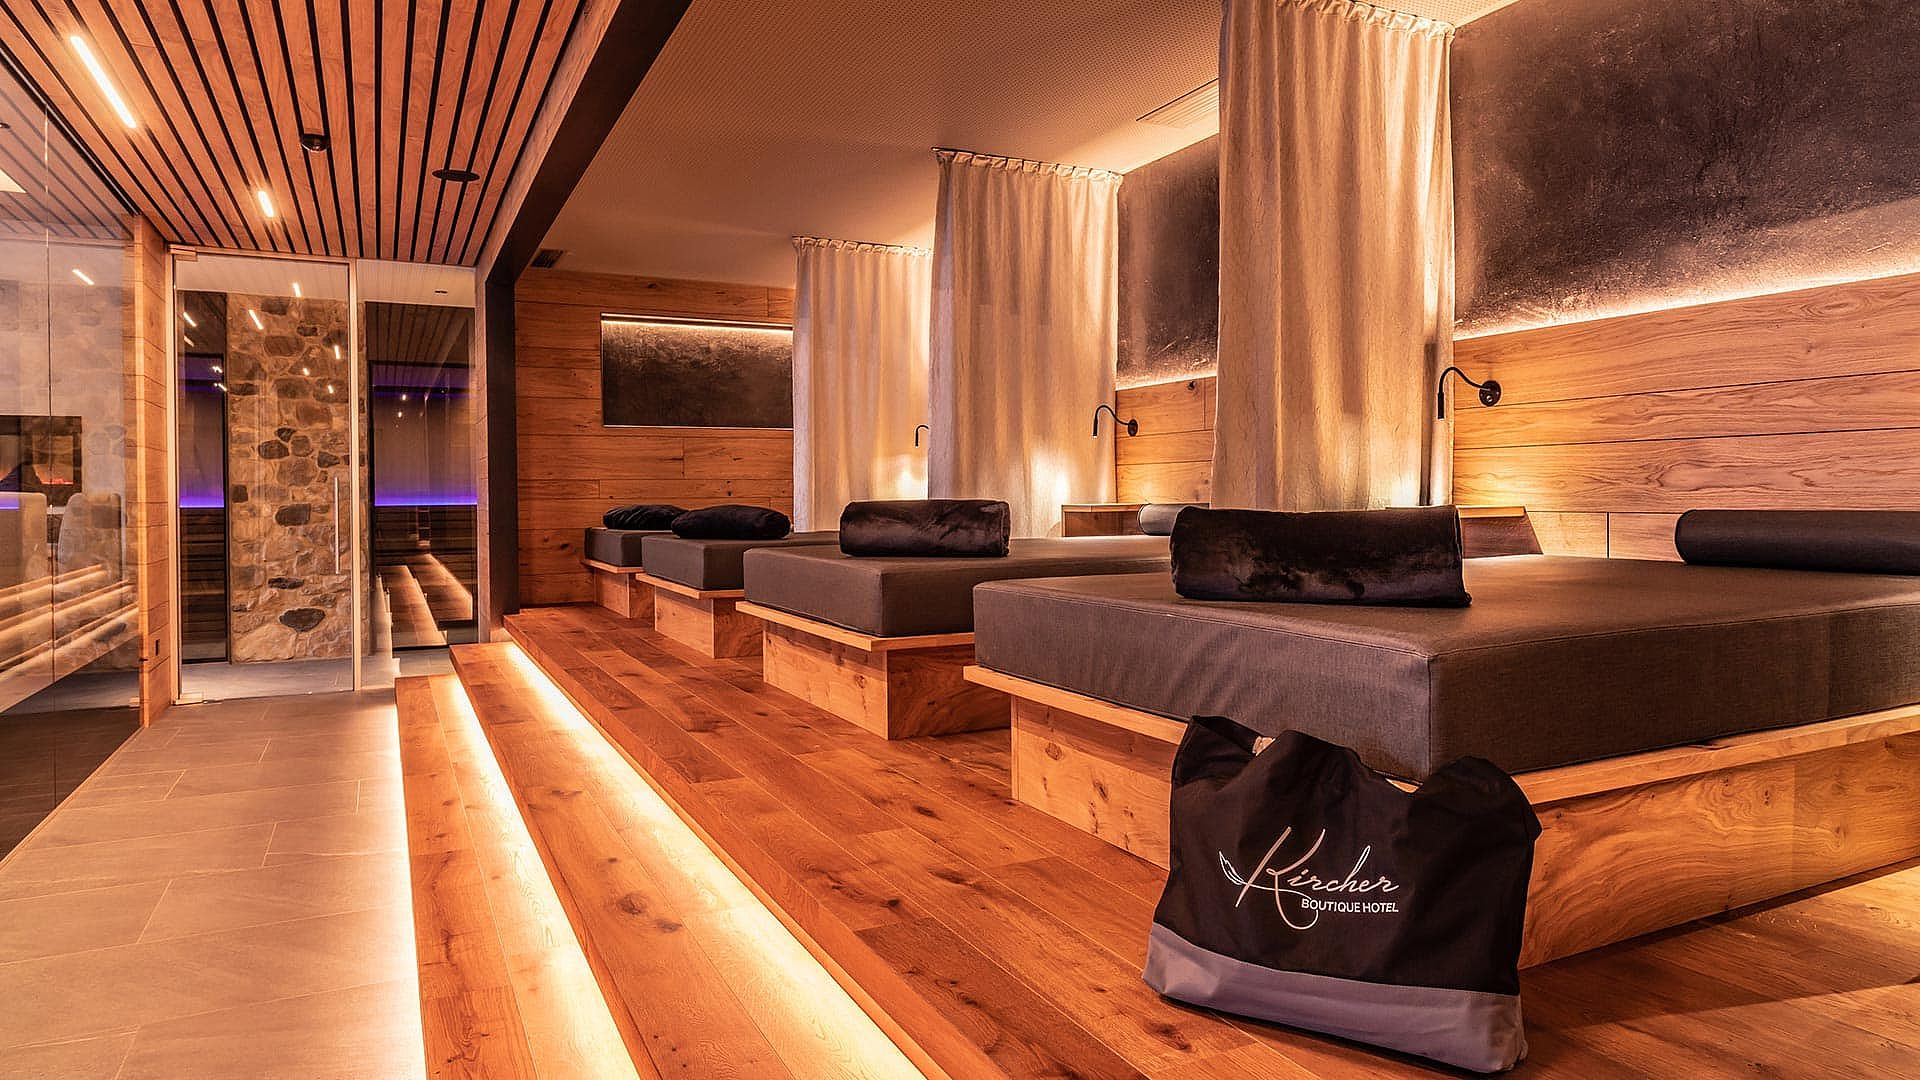 Boutique hotel kircher 4 sterne s hotel im sarntal bei bozen for Sudtirol boutique hotel